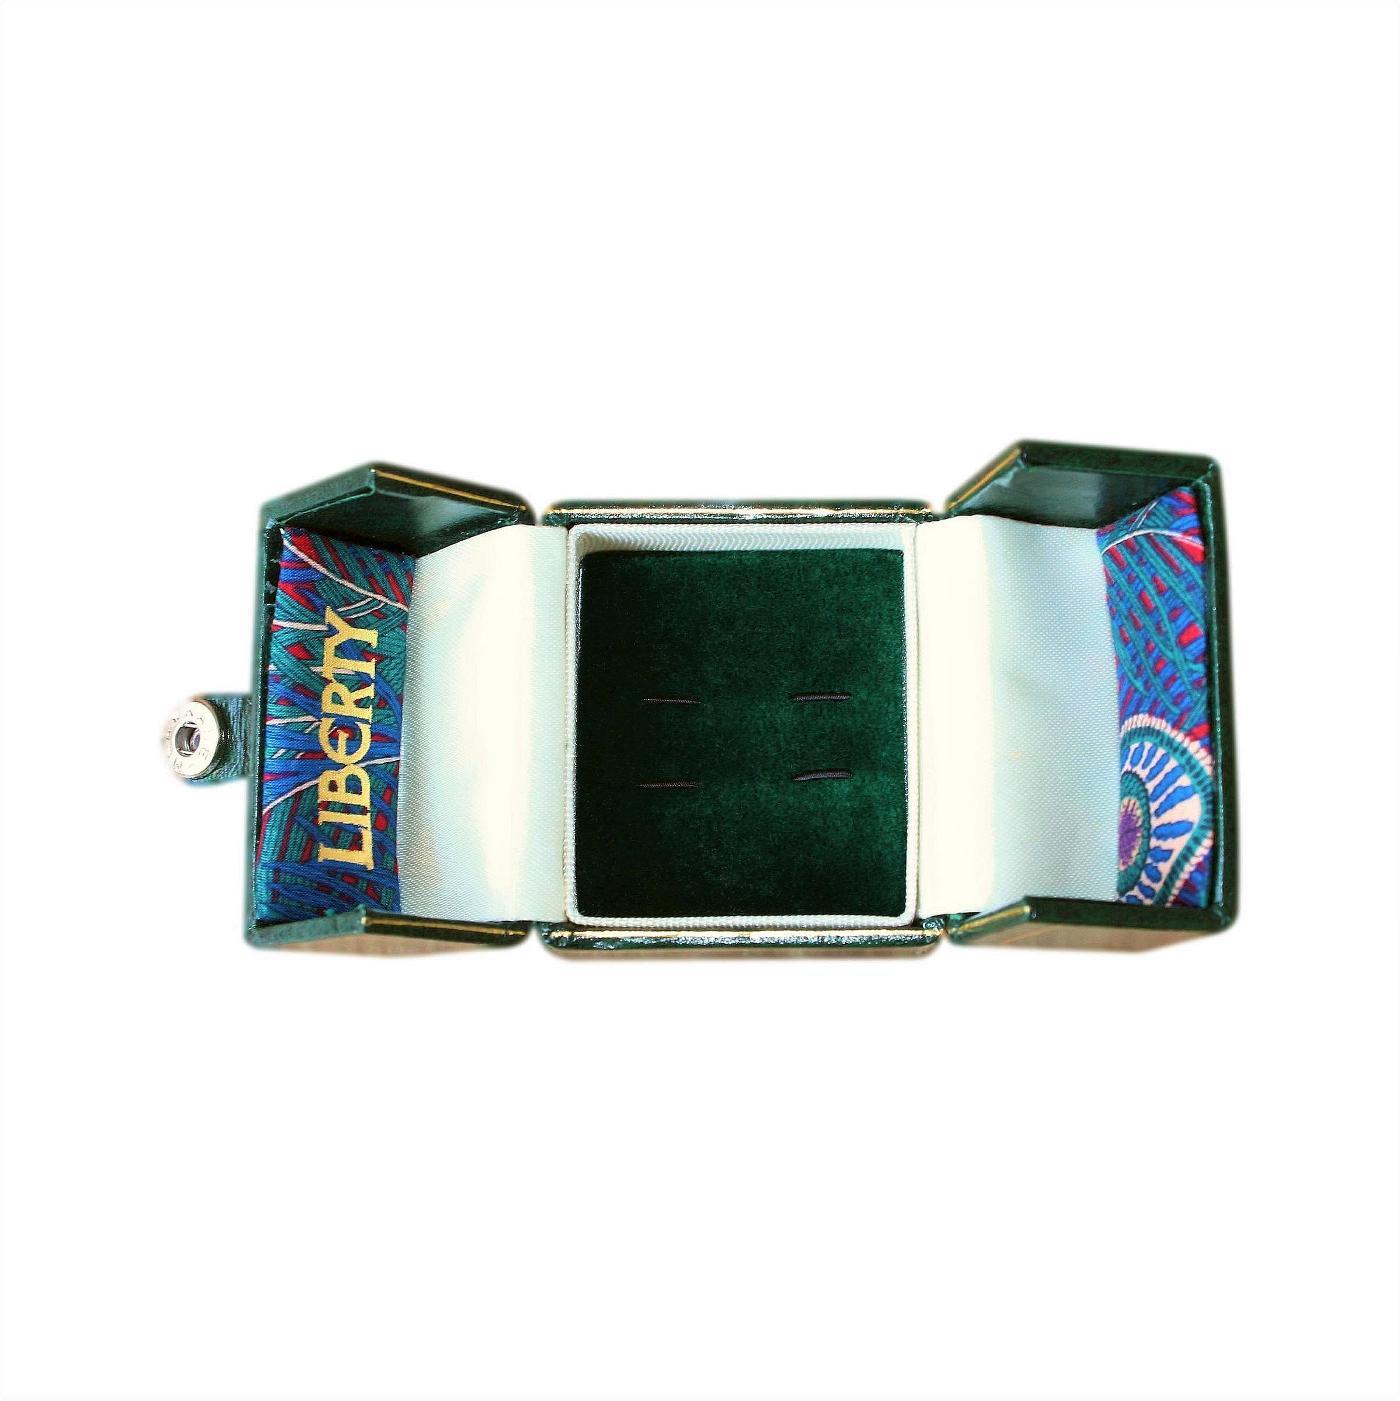 Leather Covered Genuine Liberty Jewellery Presentation Box